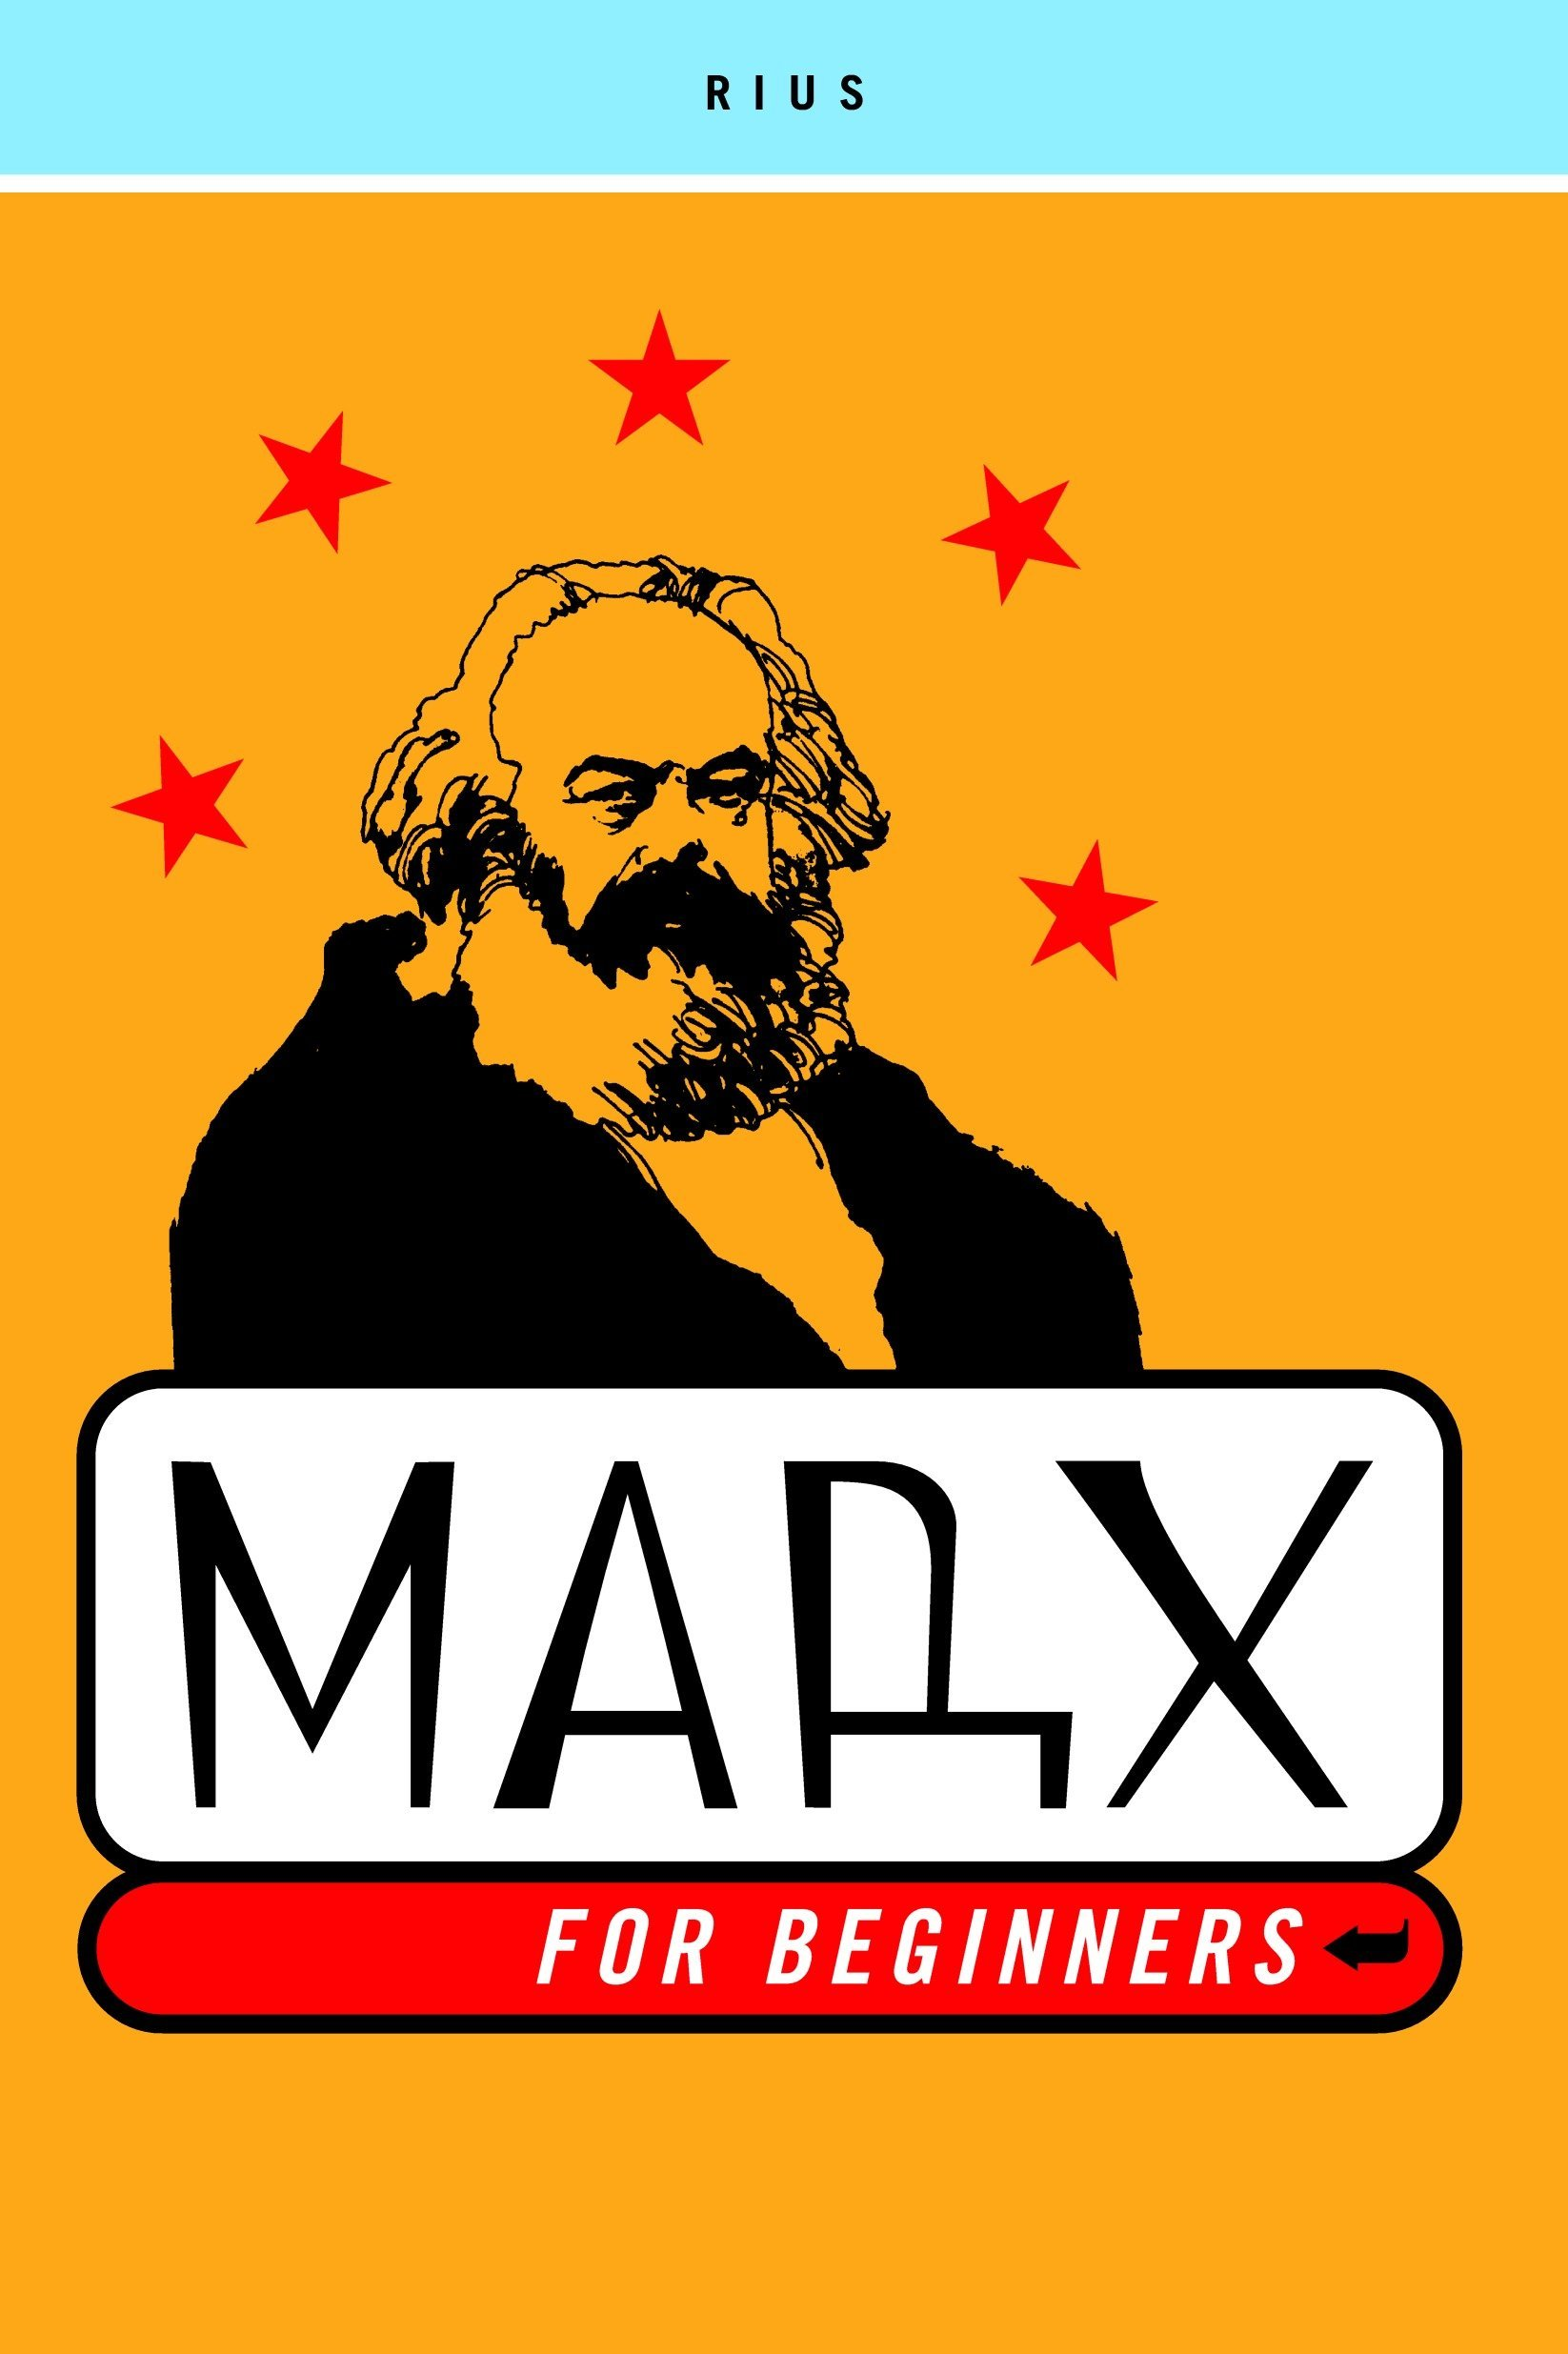 RIUS MARX FOR BEGINNERS EBOOK DOWNLOAD